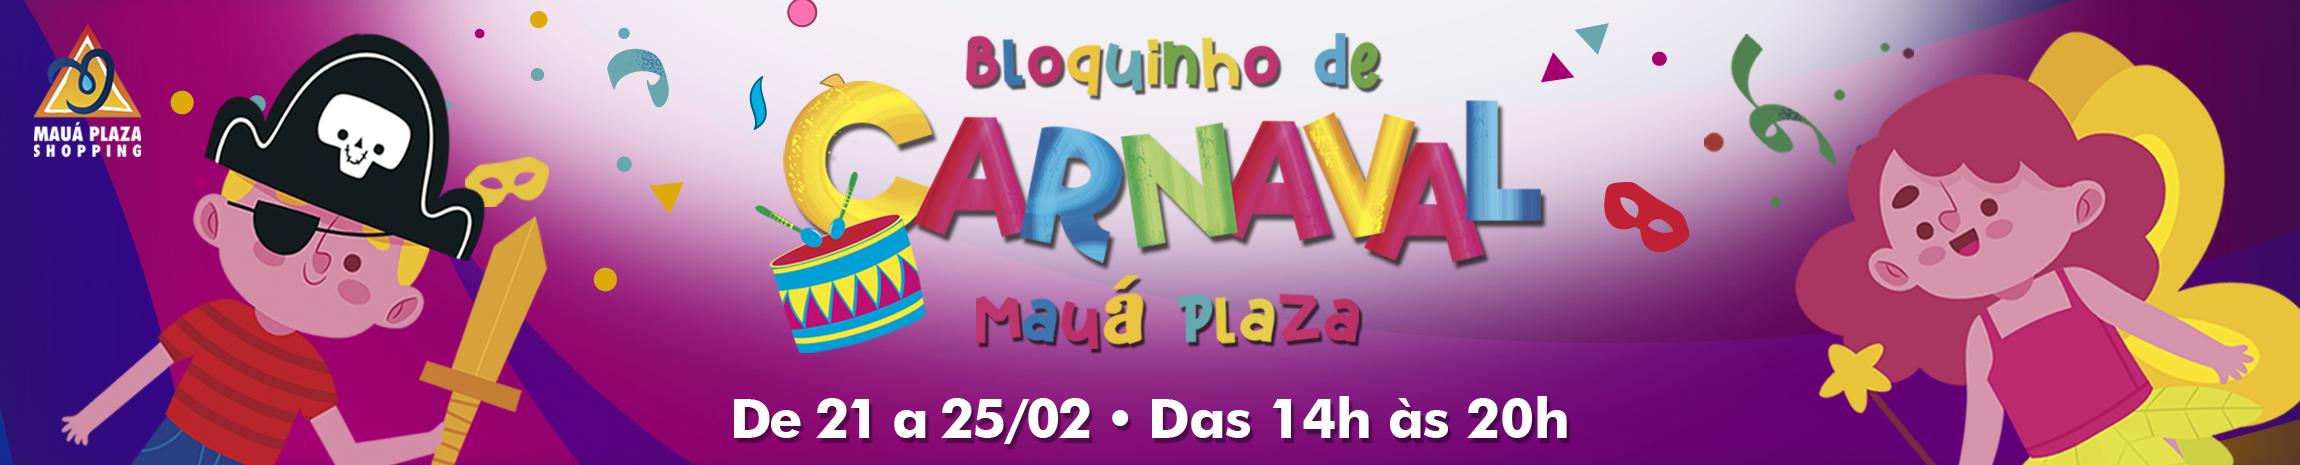 mauá plaza shopping carnaval no vipzinho